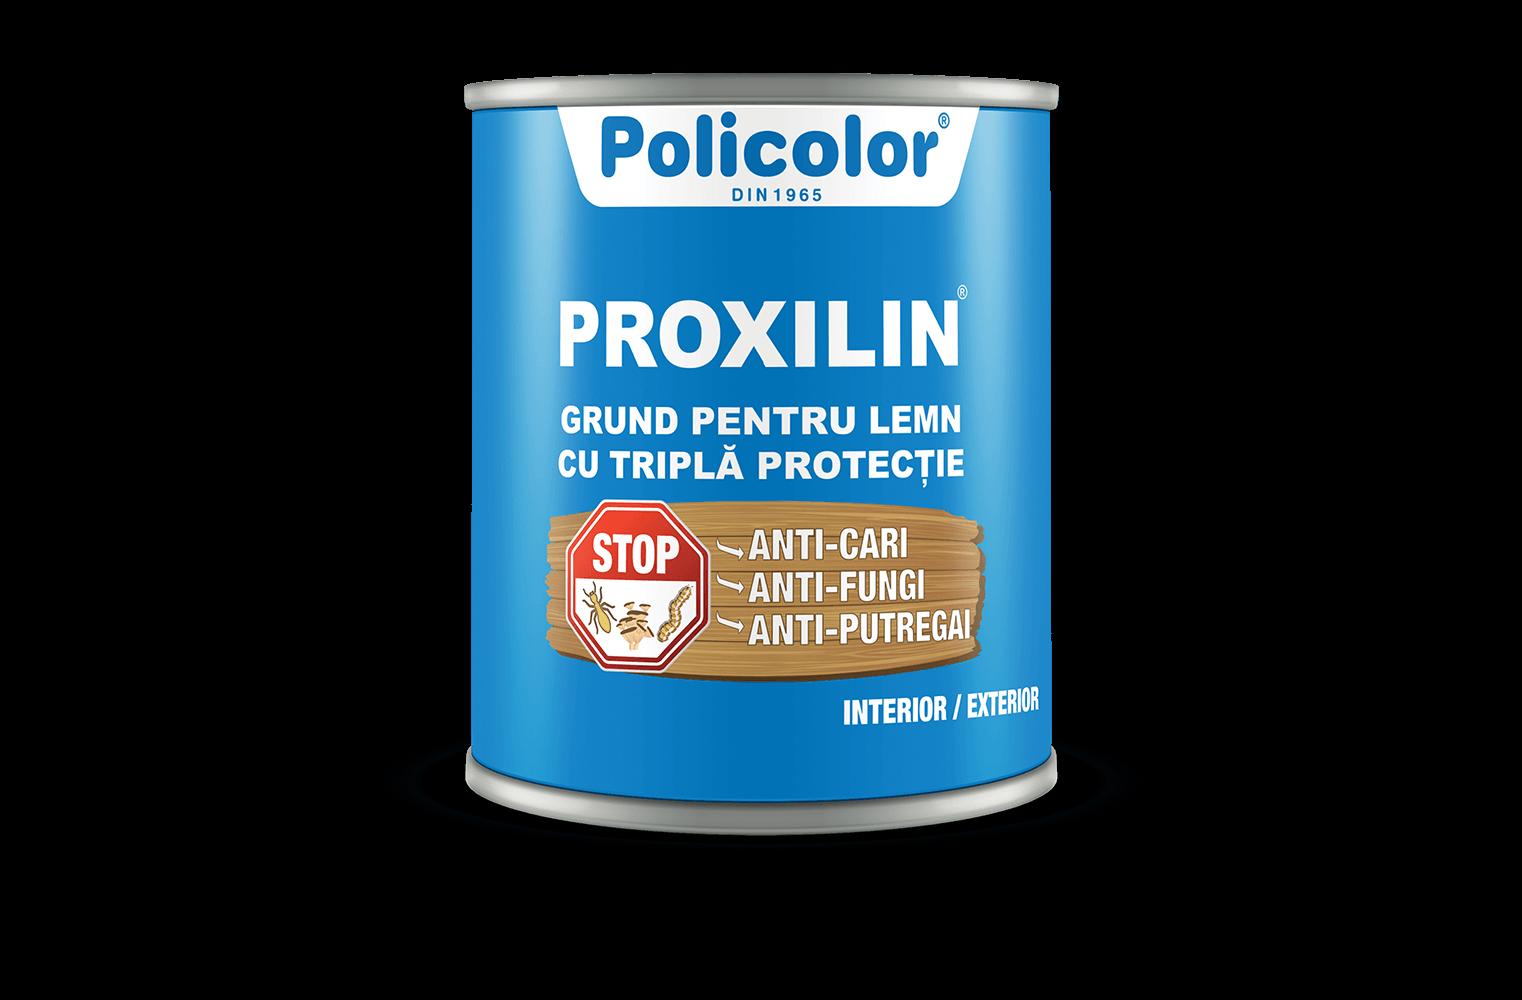 policolor_proxilin